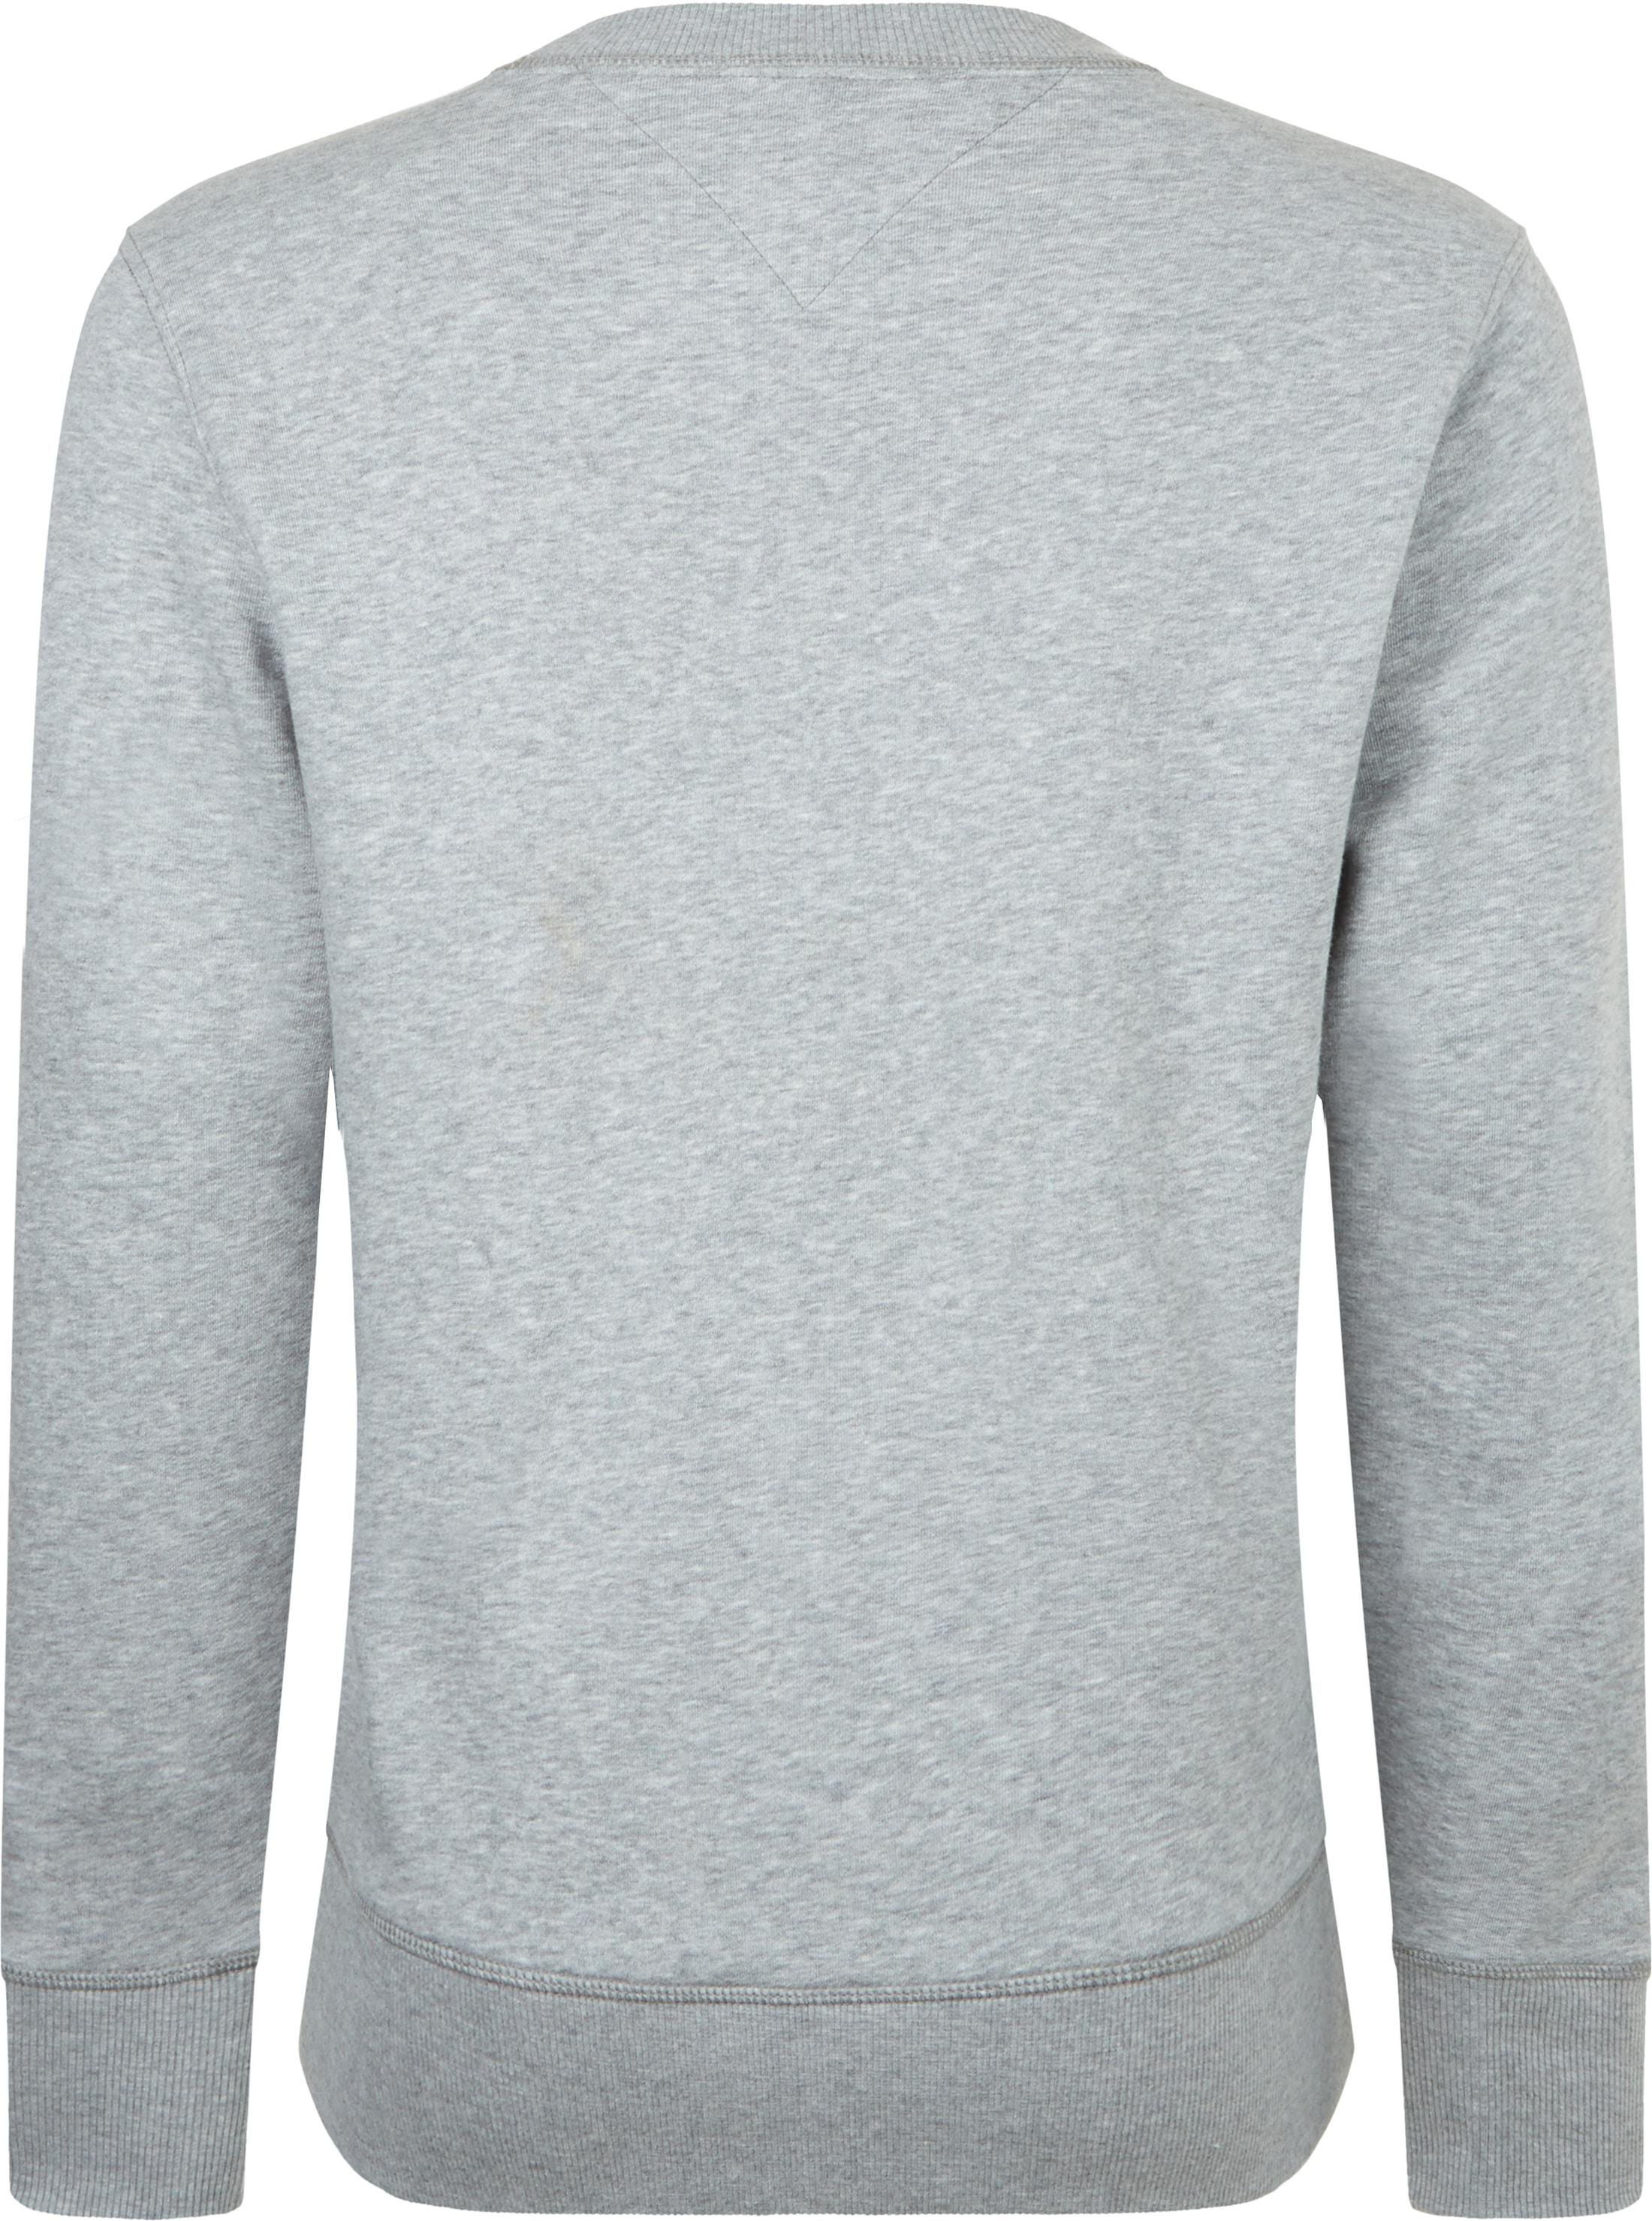 Tommy Hilfiger Sweater Grey foto 1